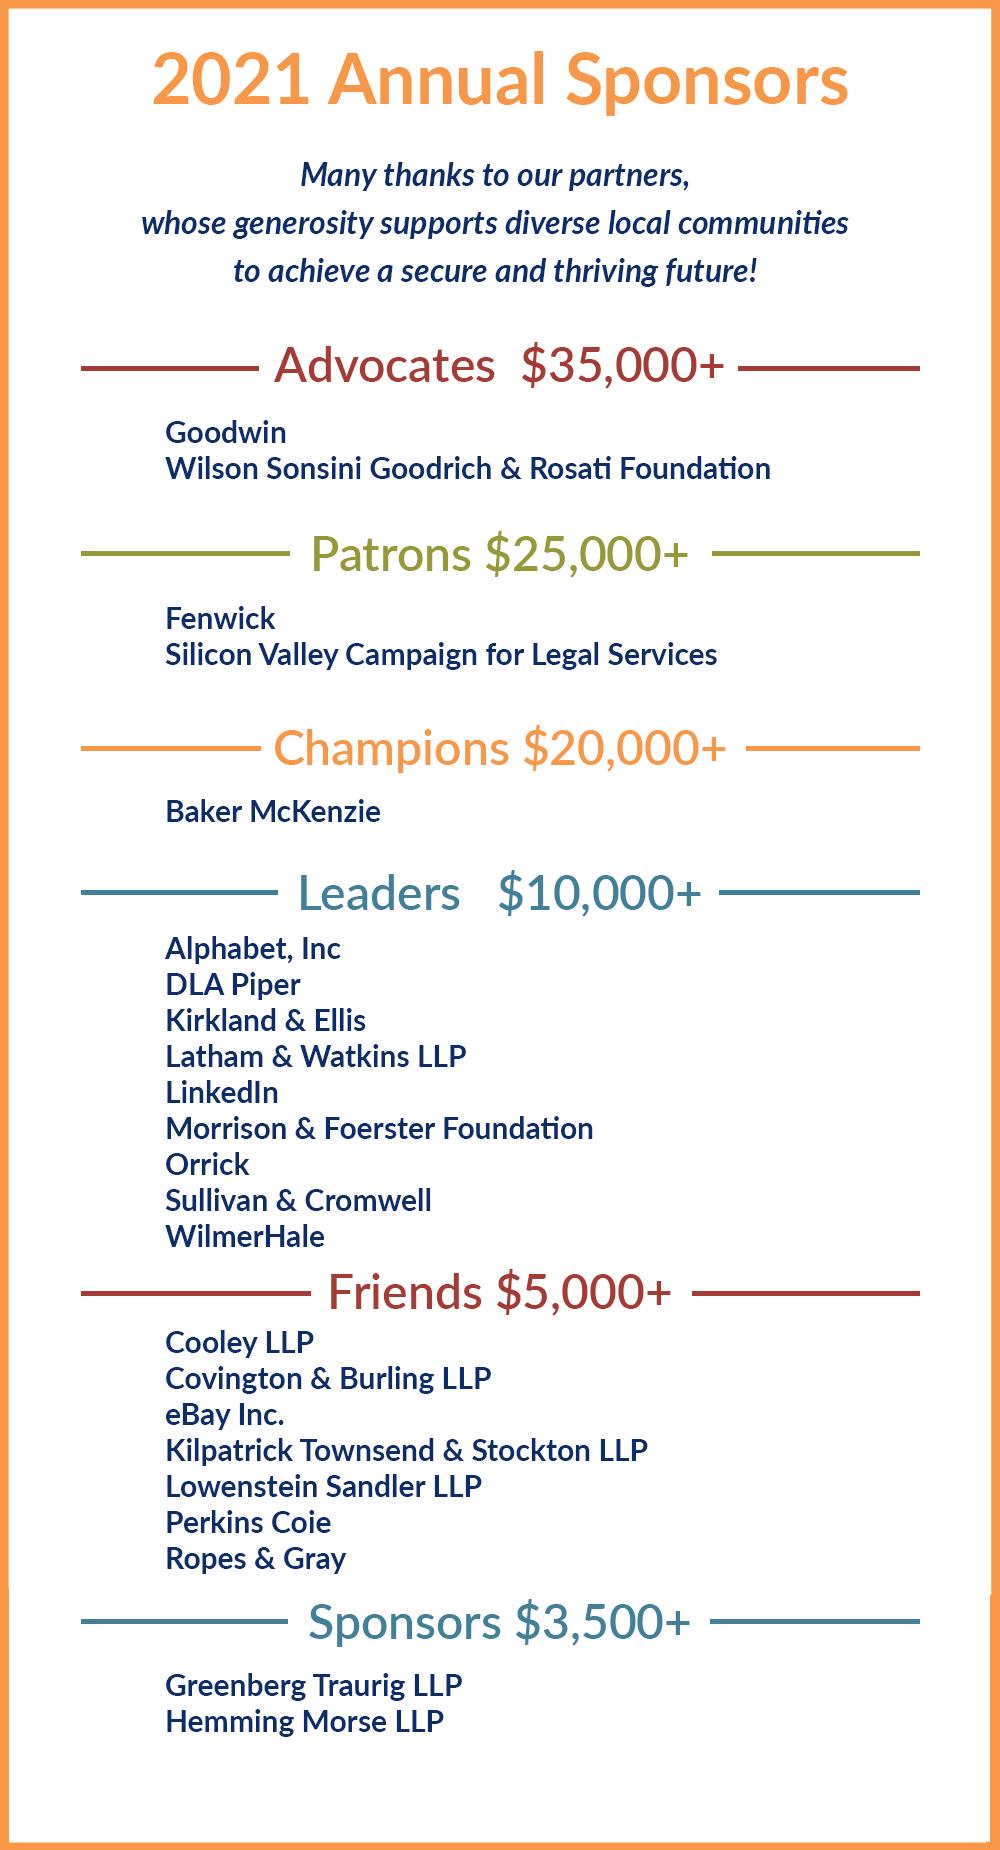 2021 Annual Sponsors